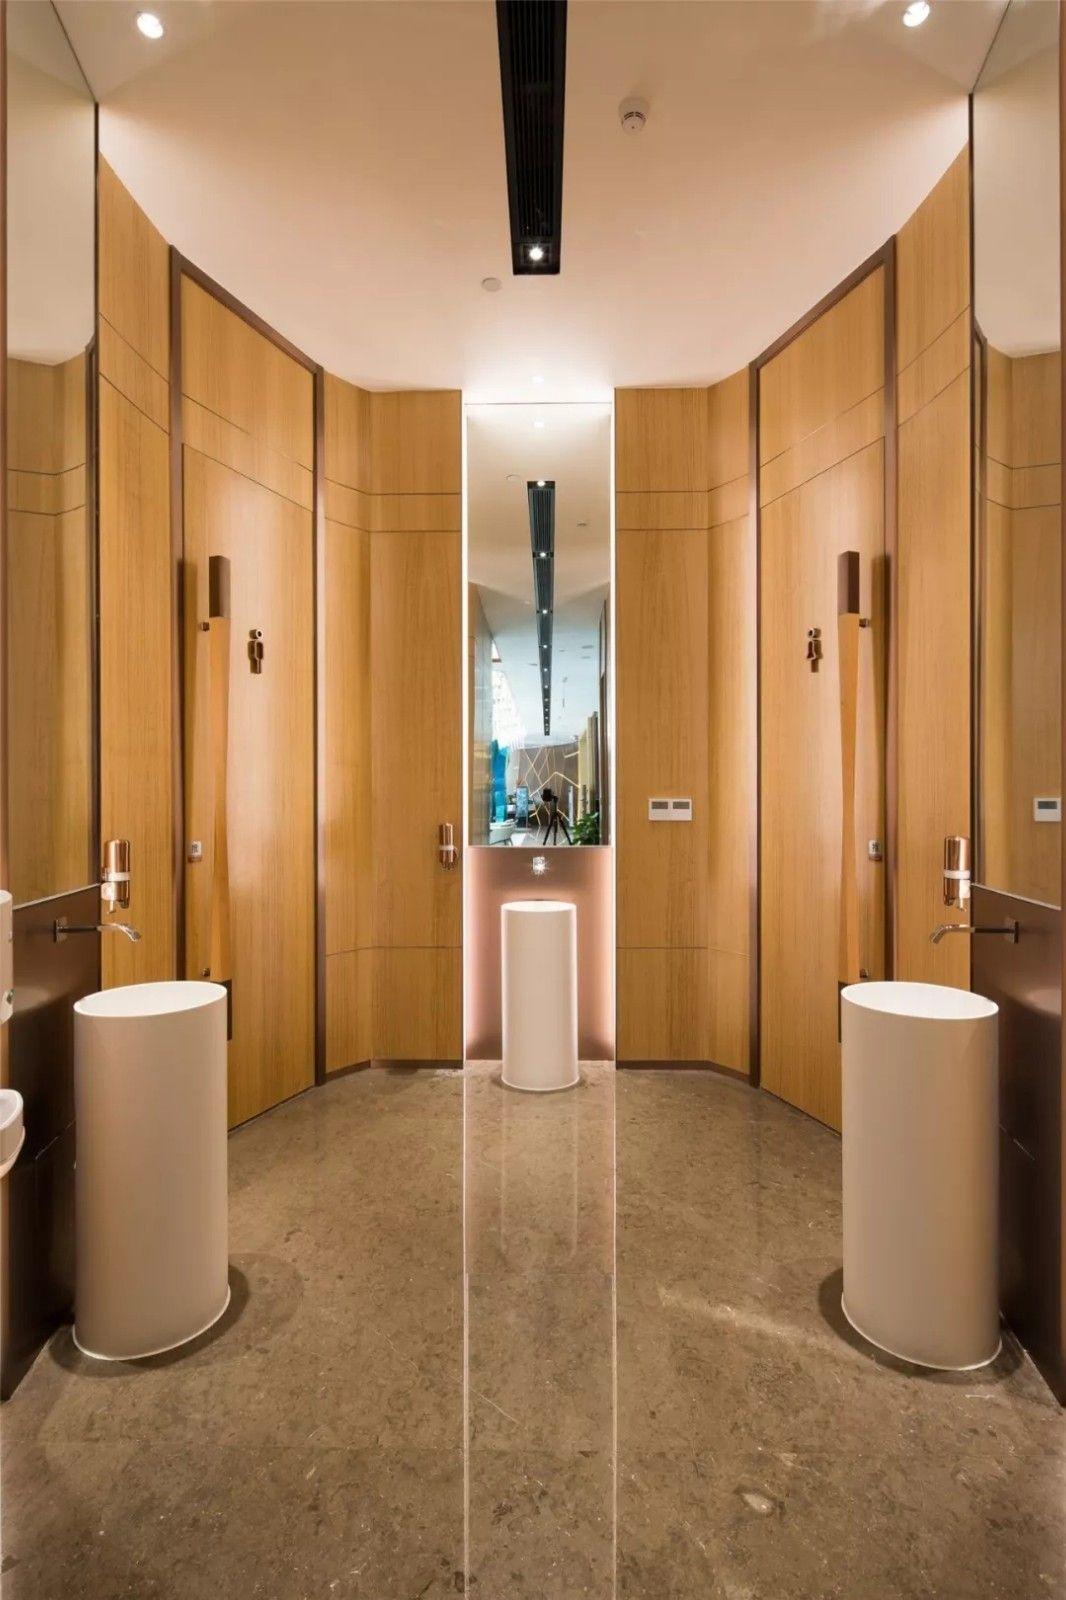 1840 Interior Design: 2019 的 深圳松茂·柏景湾营销中心